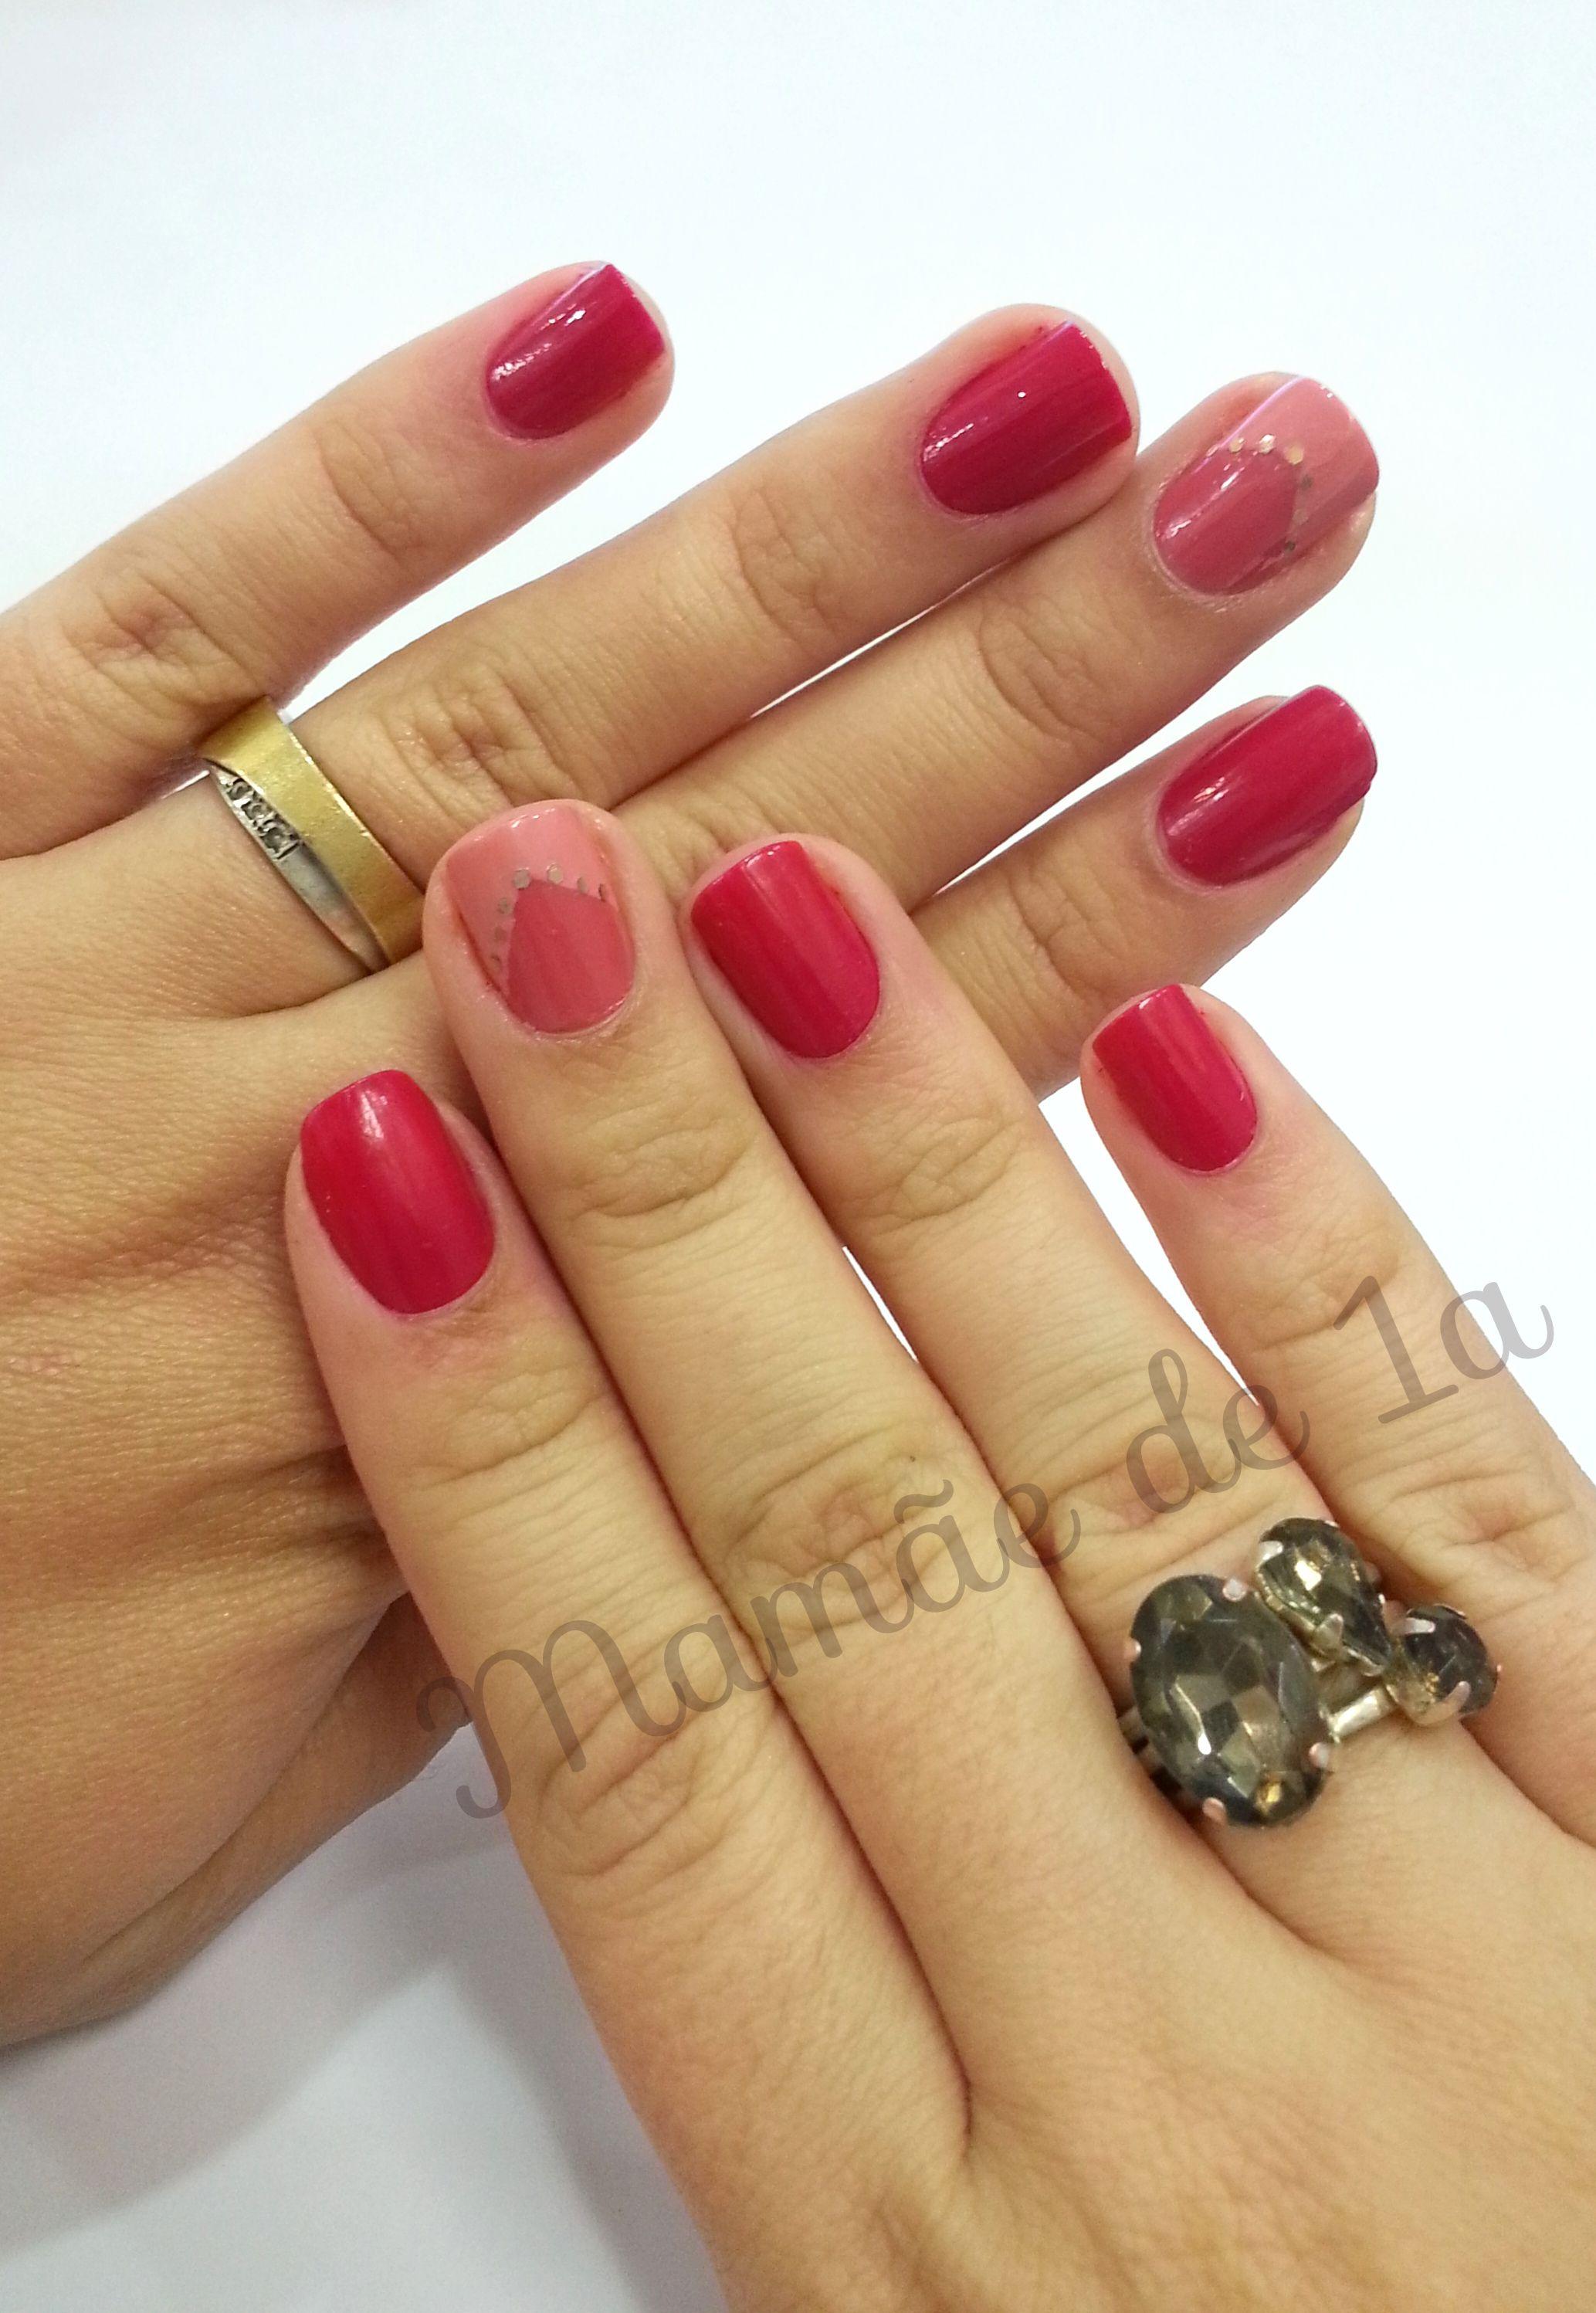 pink nails colorama risque http://mamaede1a.wordpress.com/2014/09/03/nail-art-pink/